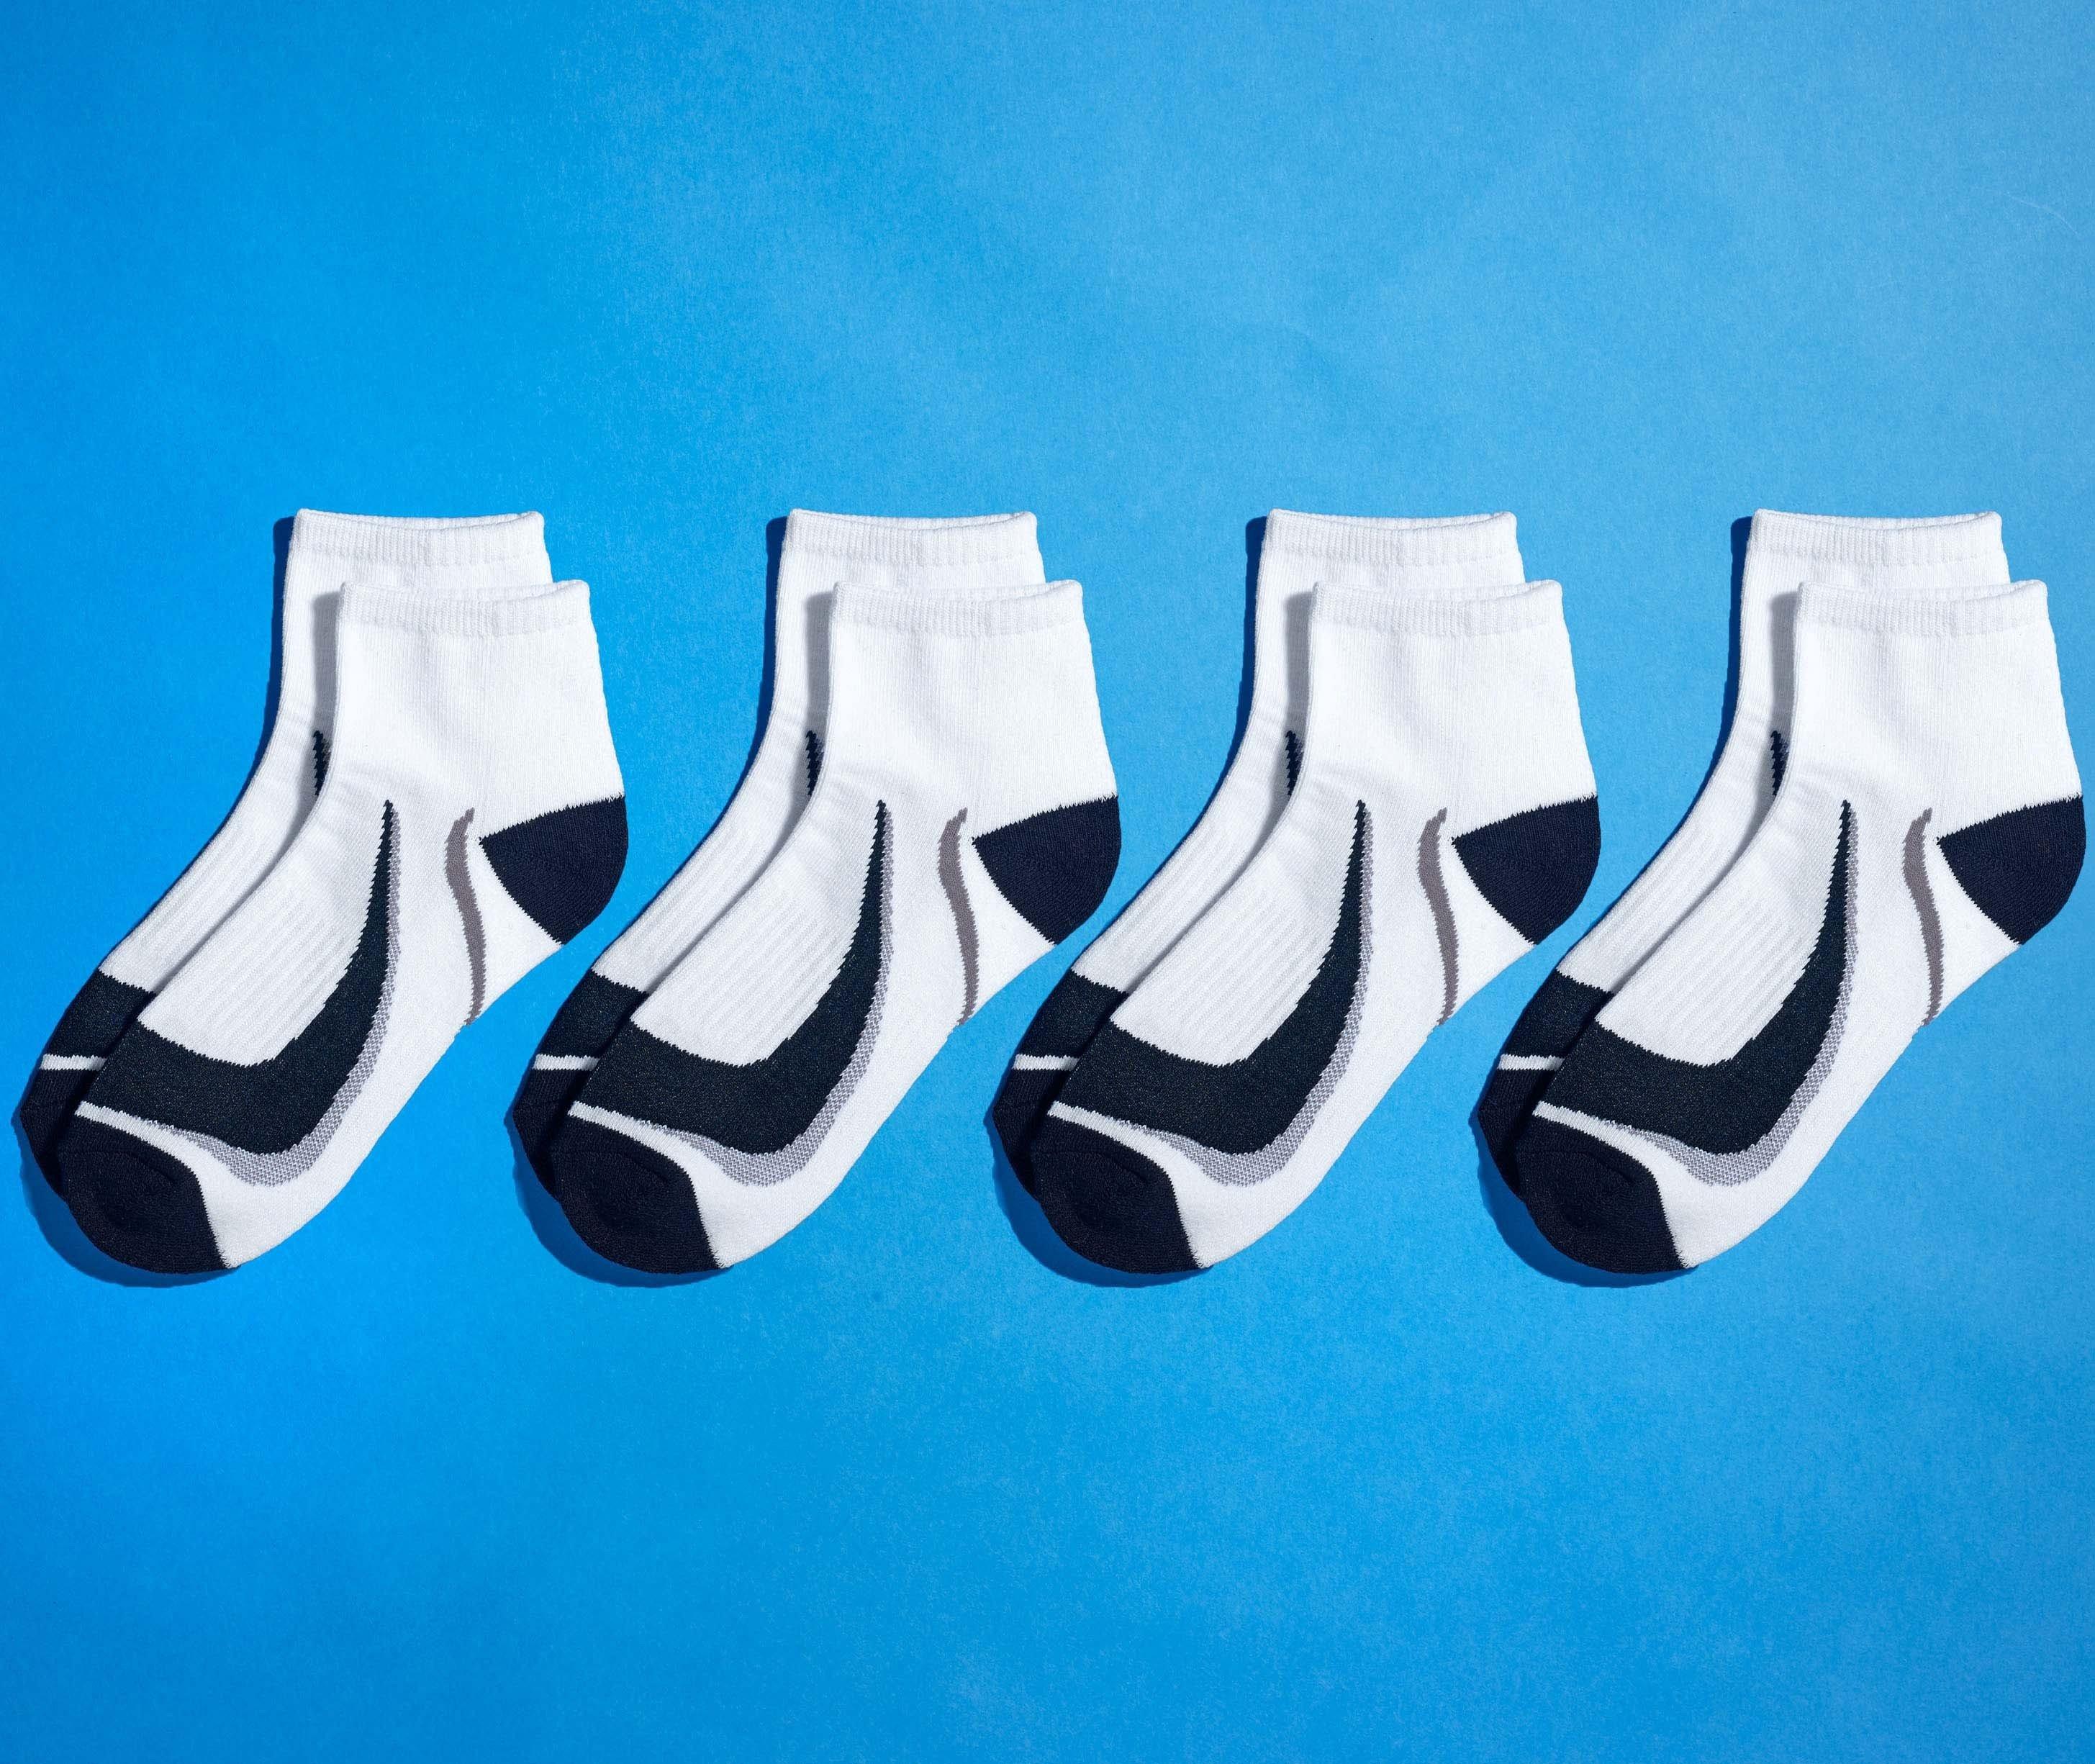 Unisex-Sport-Sneakers set di 4 paia